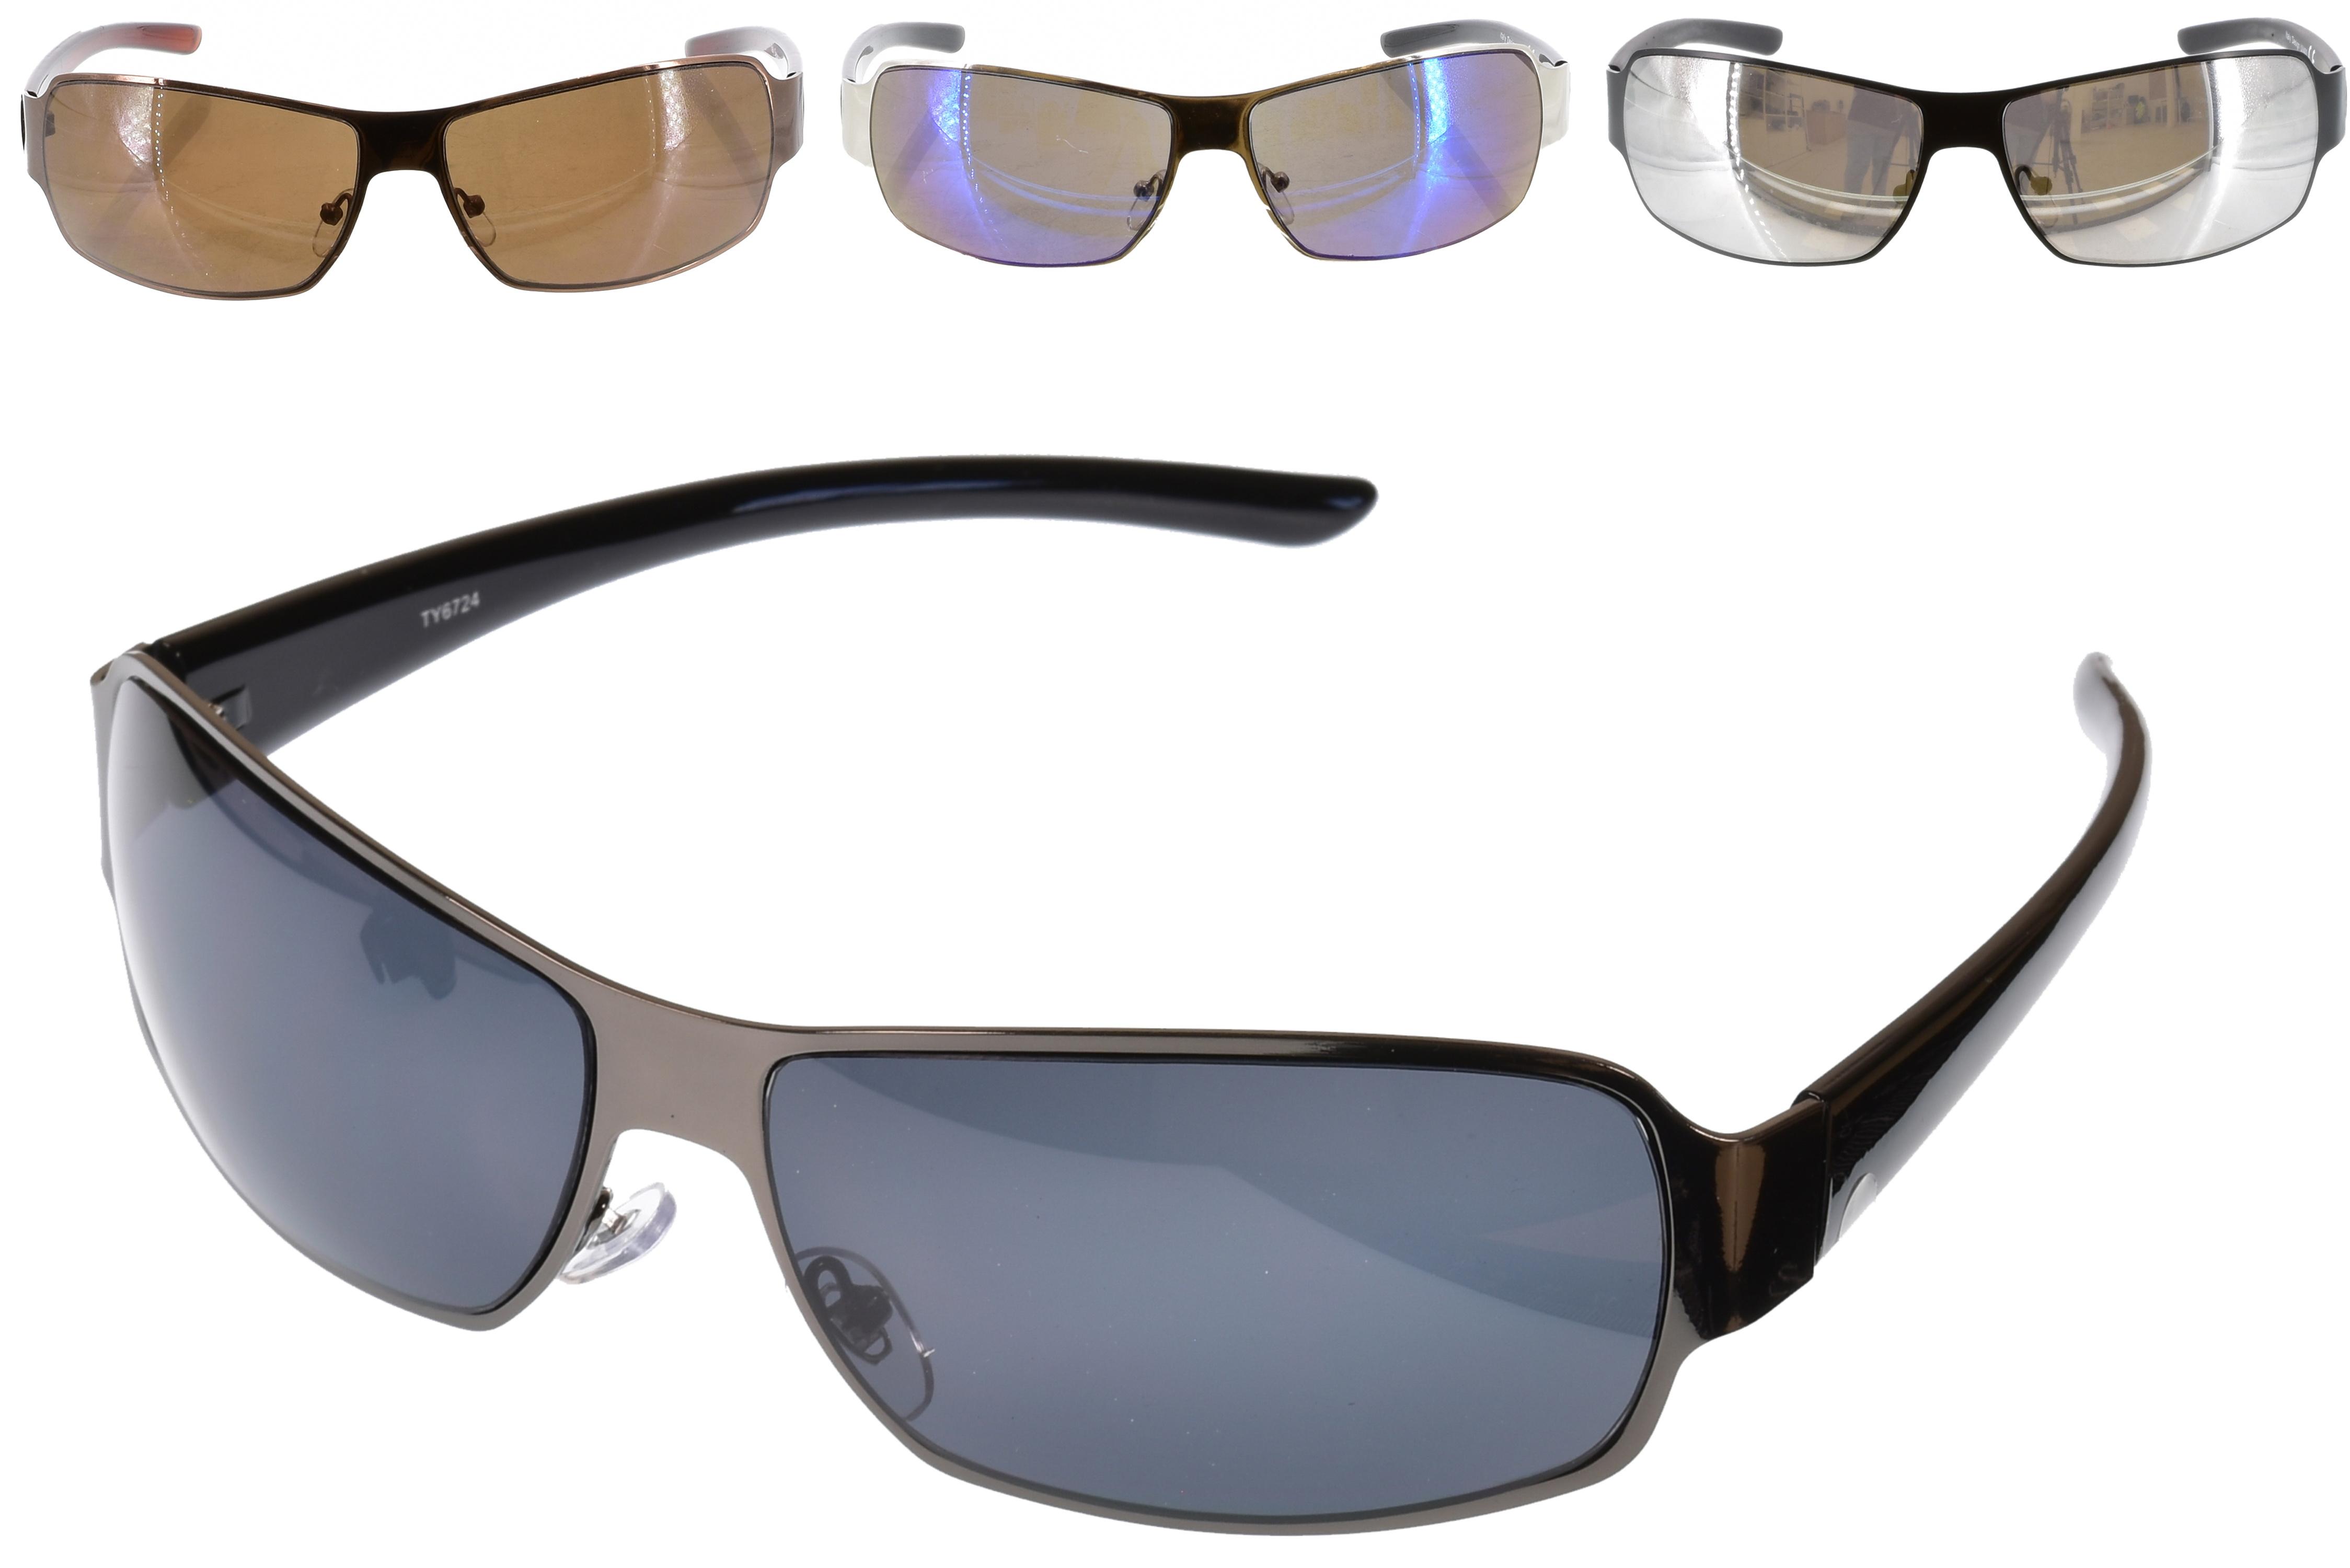 Mens Metal Frame Plastic Arm Sunglasses - 4 Assorted